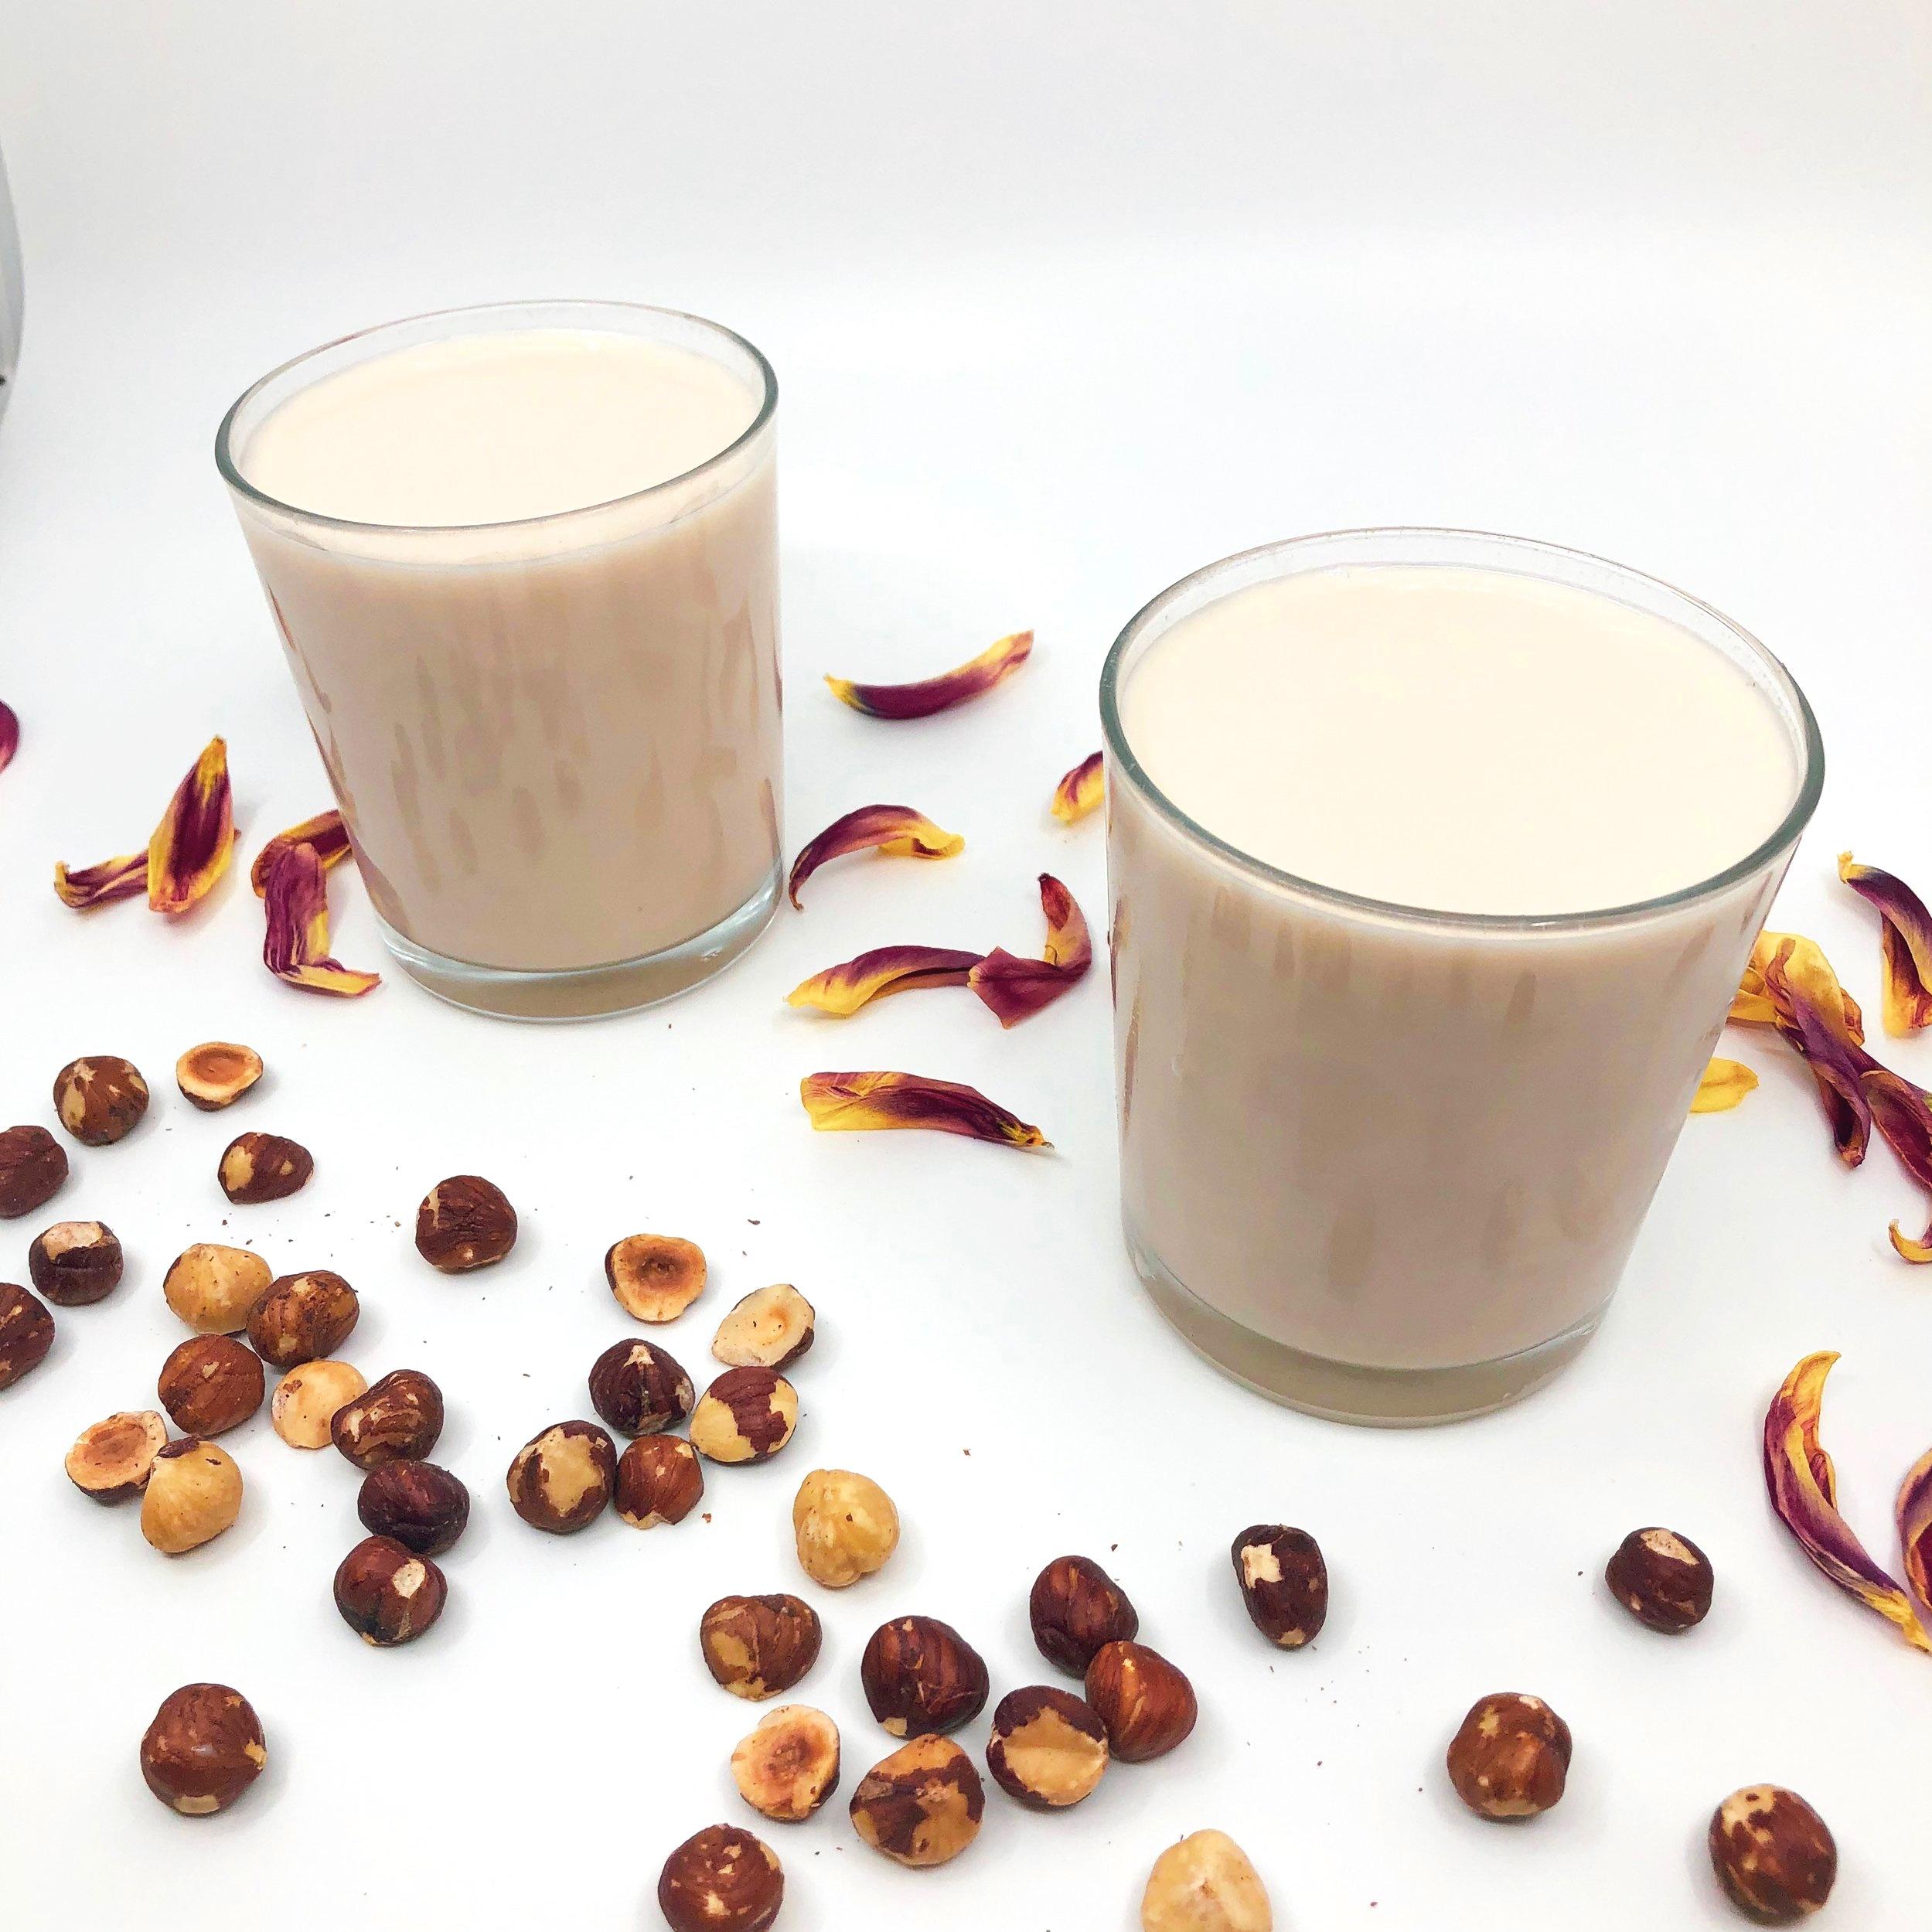 Hazelnut Mylk  - Vegan, Gluten-Free, Dairy-Free